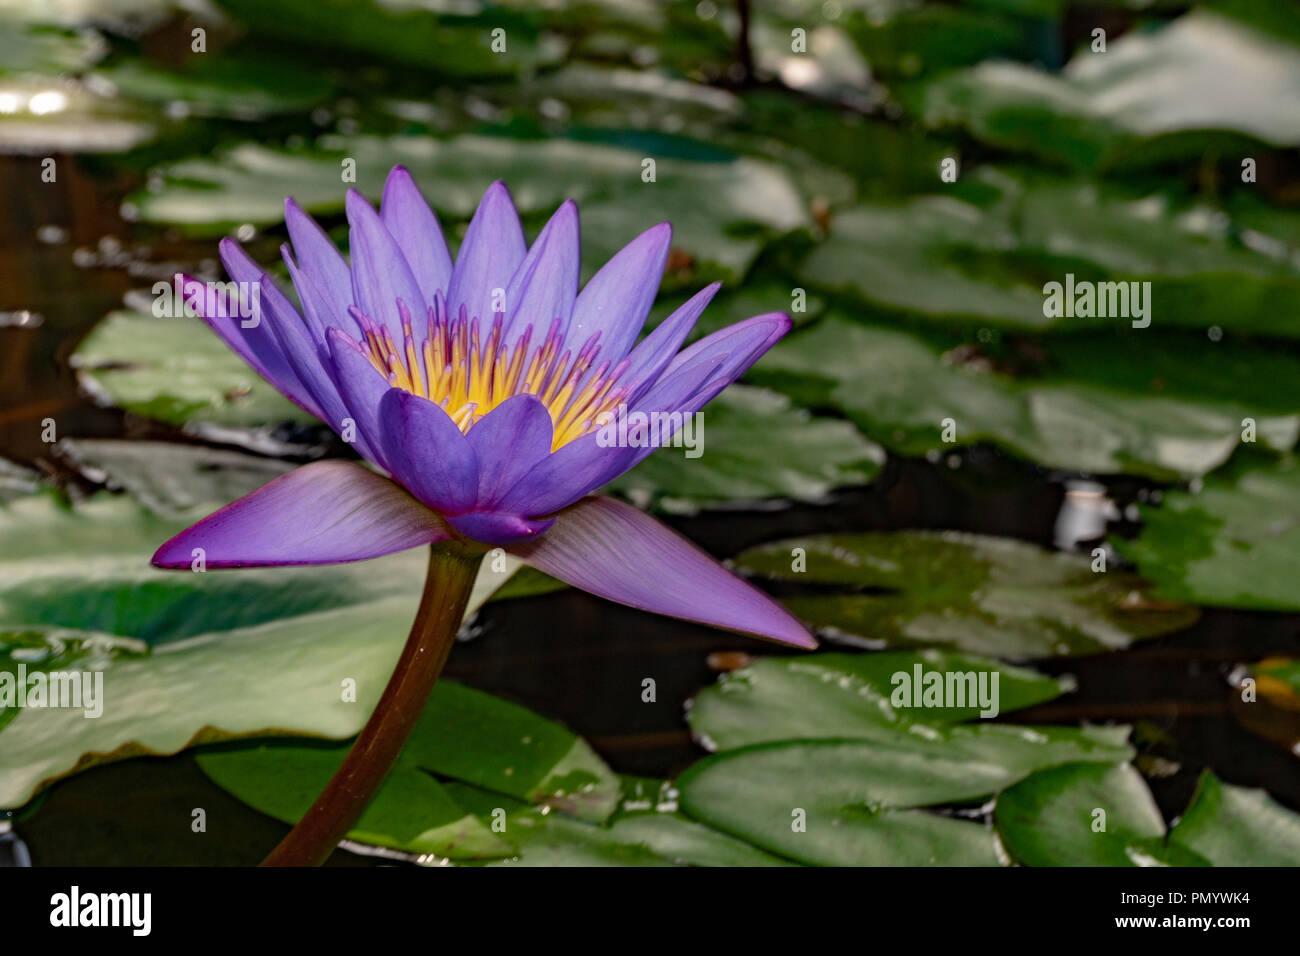 Purple lily flower in french polynesia stock photo 219430376 alamy purple lily flower in french polynesia izmirmasajfo